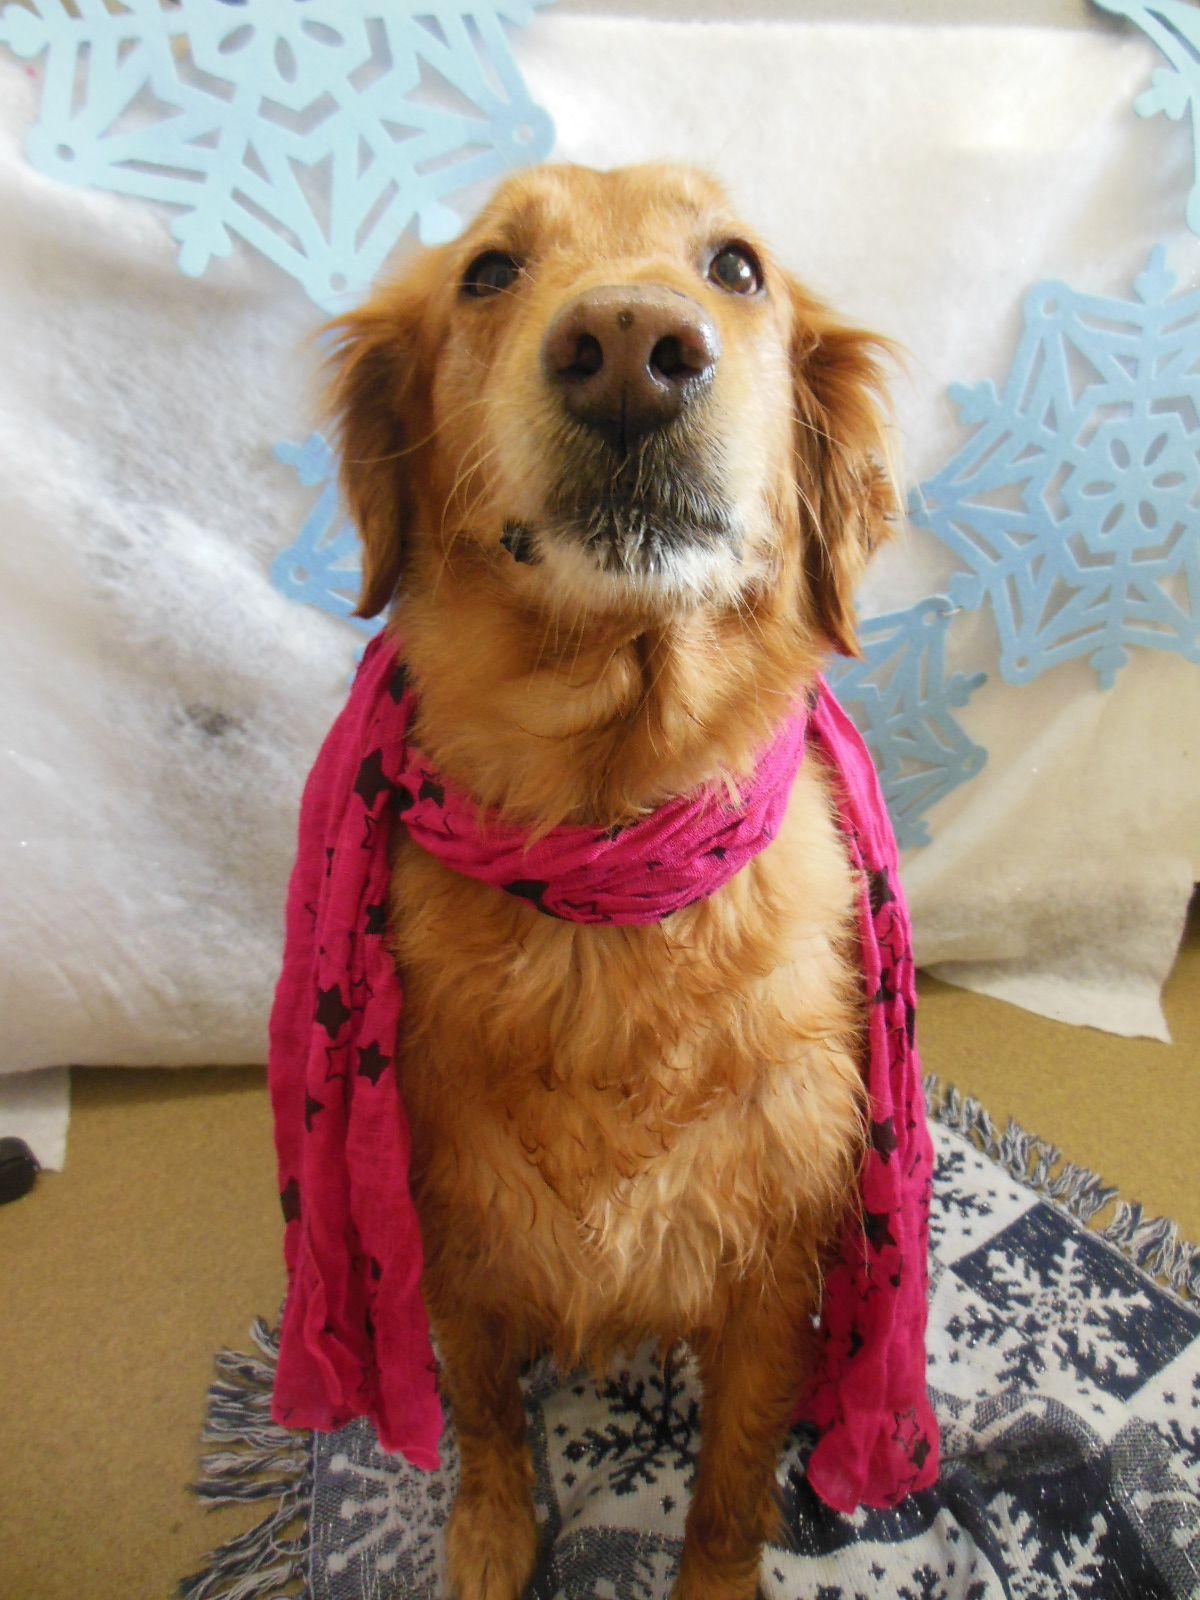 Pin By Pet Paradise Palm Coast On Wacky Wednesday Lily Pulitzer Golden Retriever Lily Pulitzer Dress